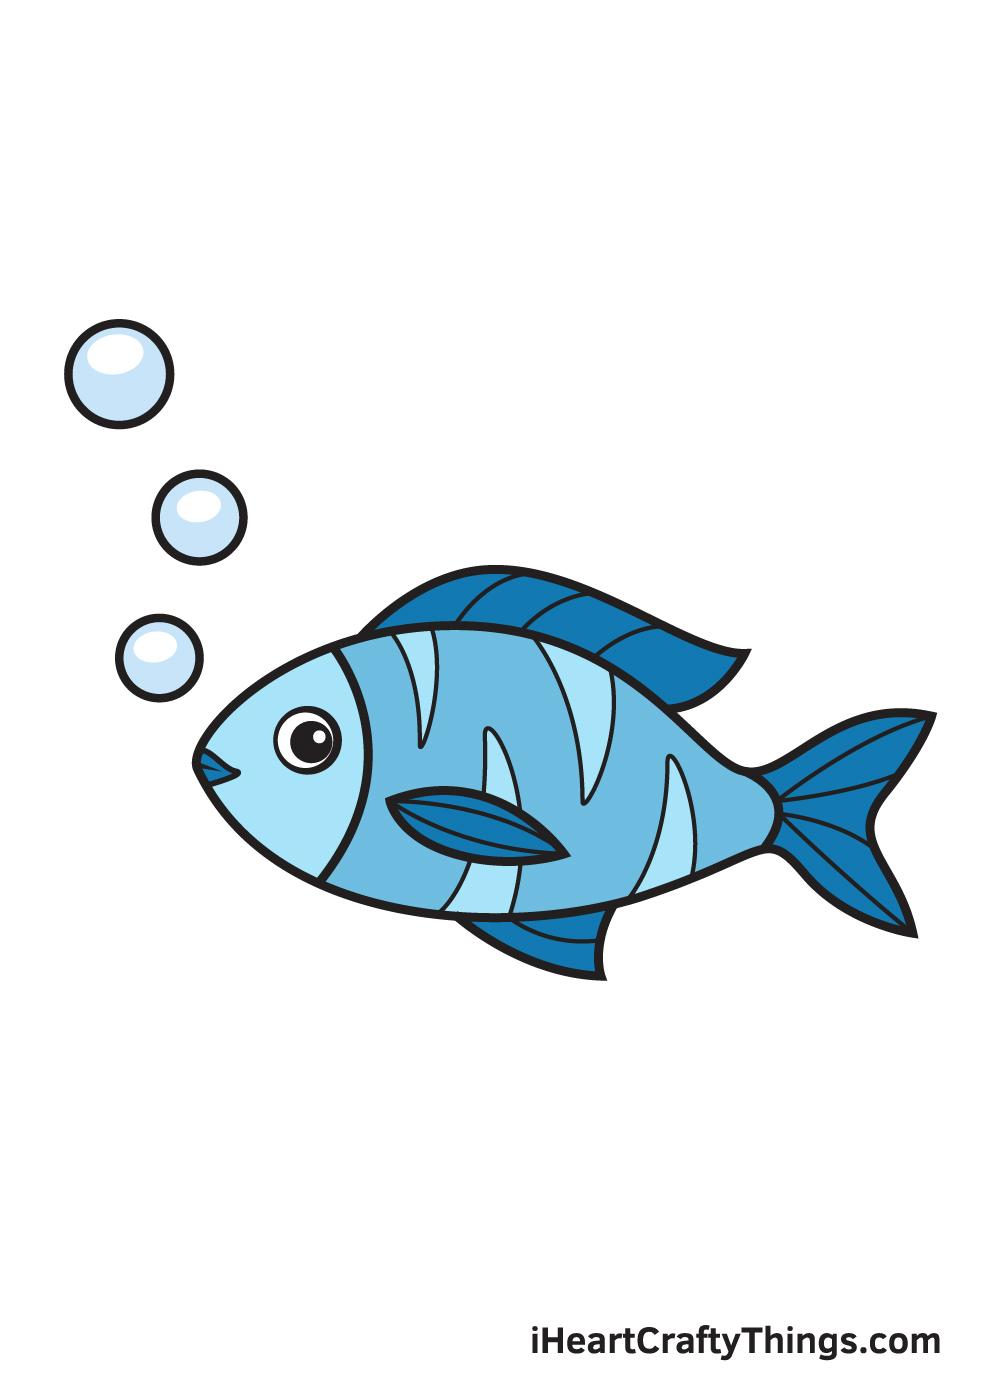 fish drawing - 9 steps